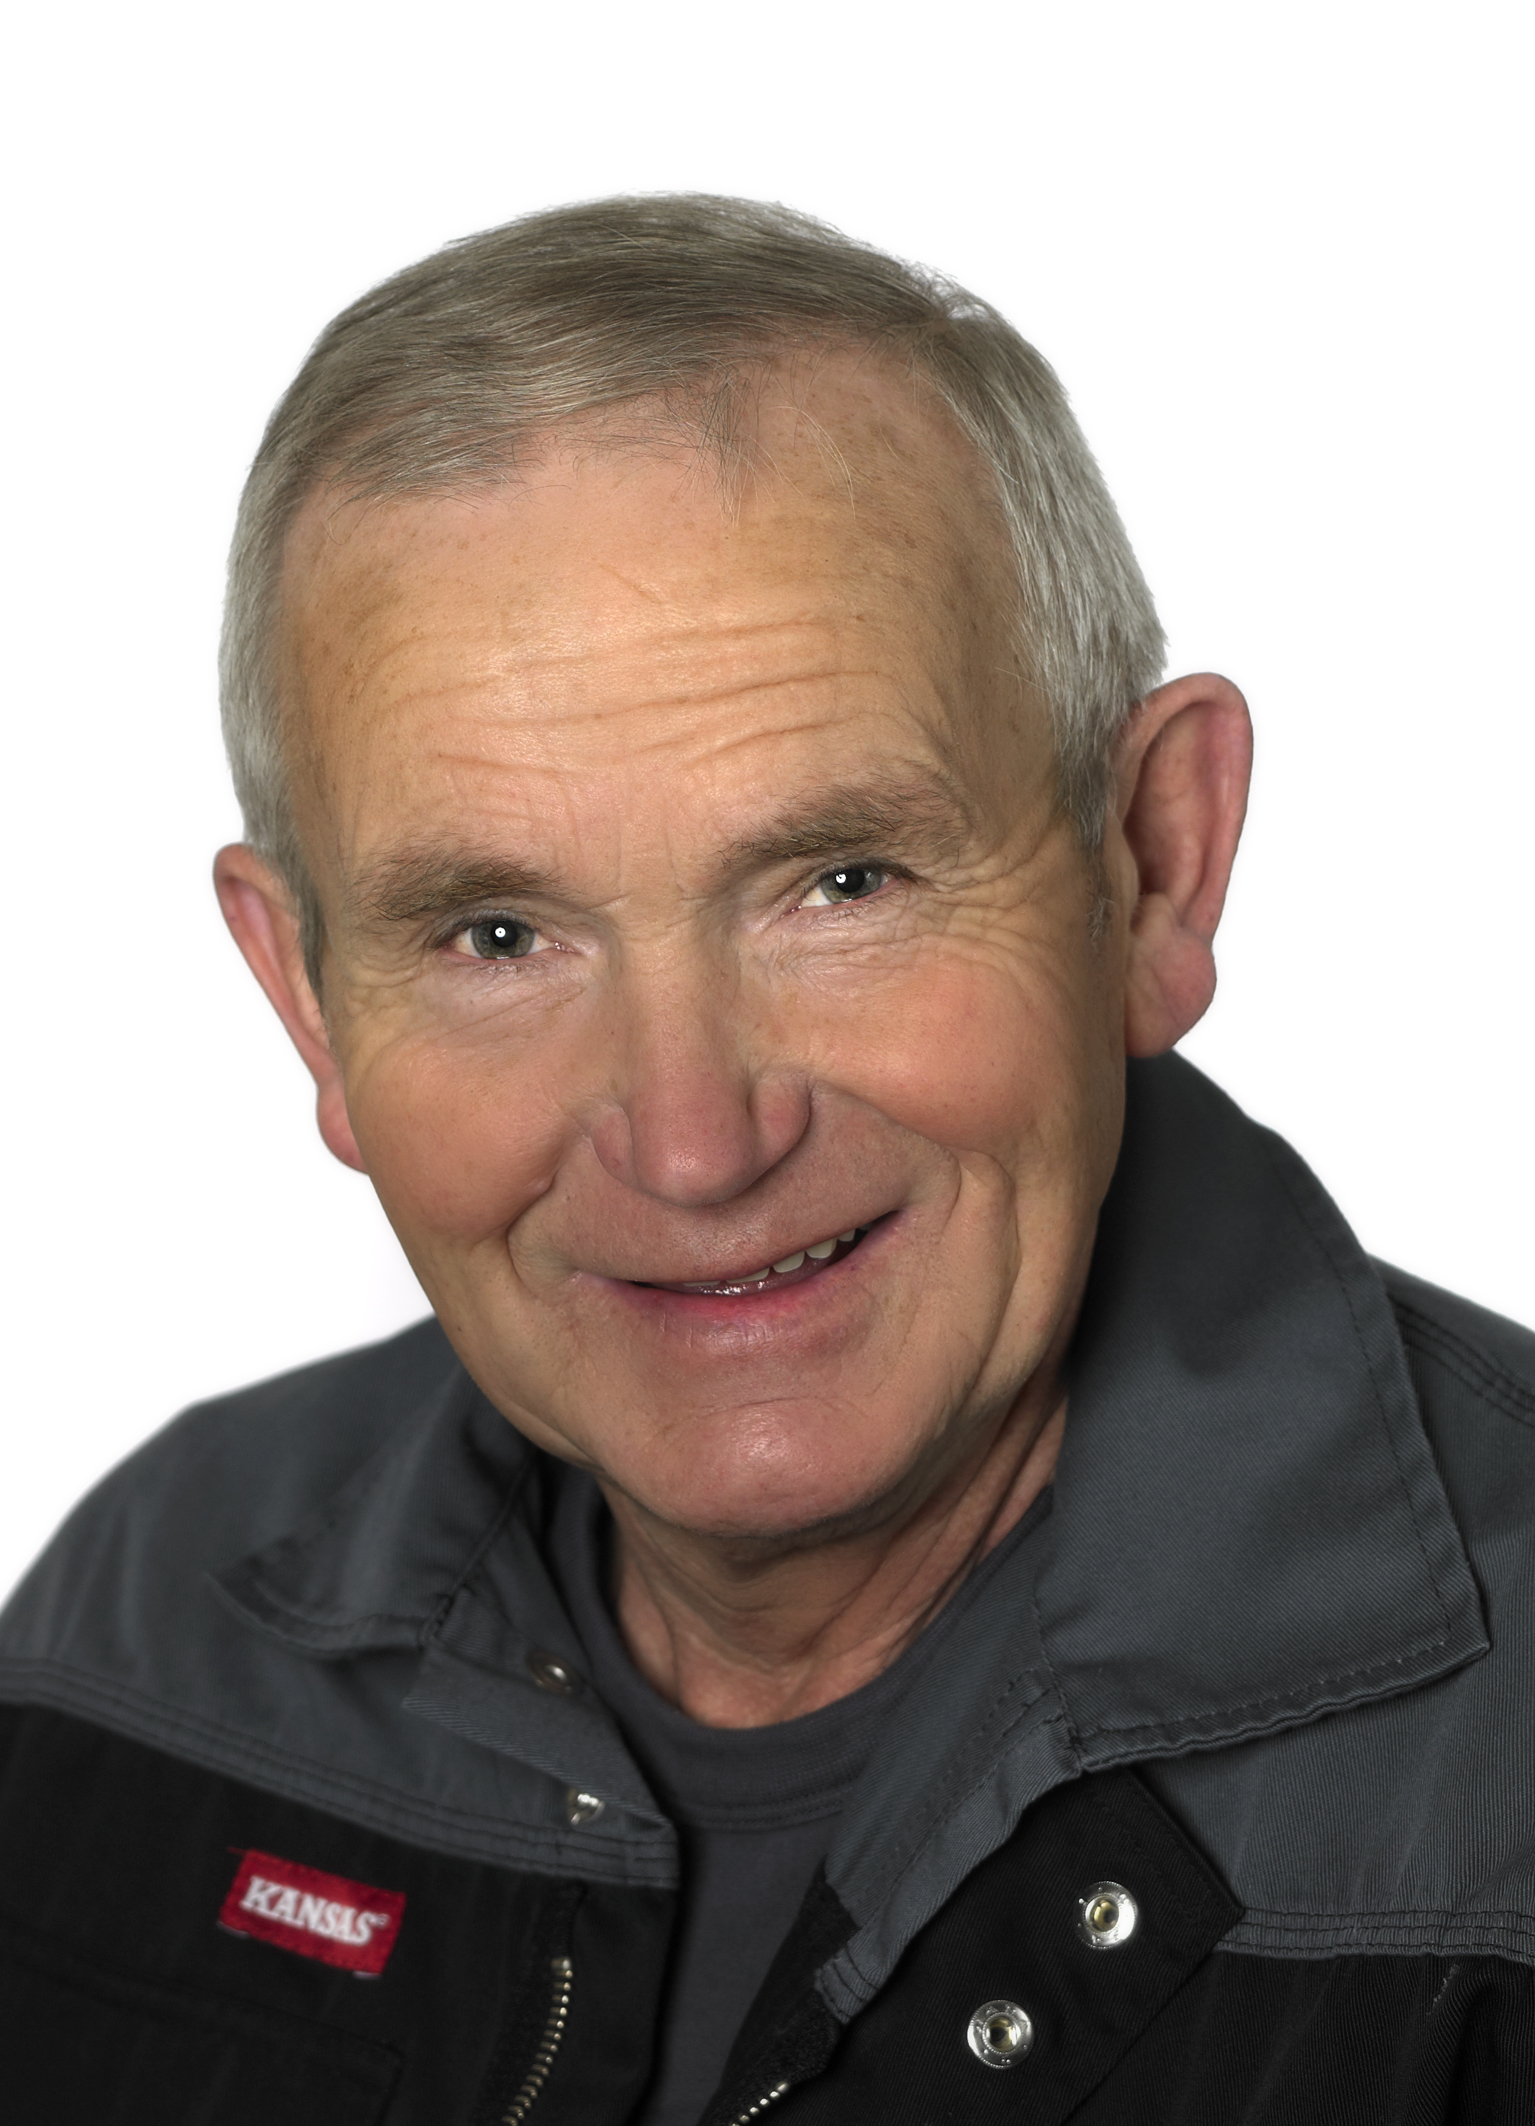 Georg Lorz